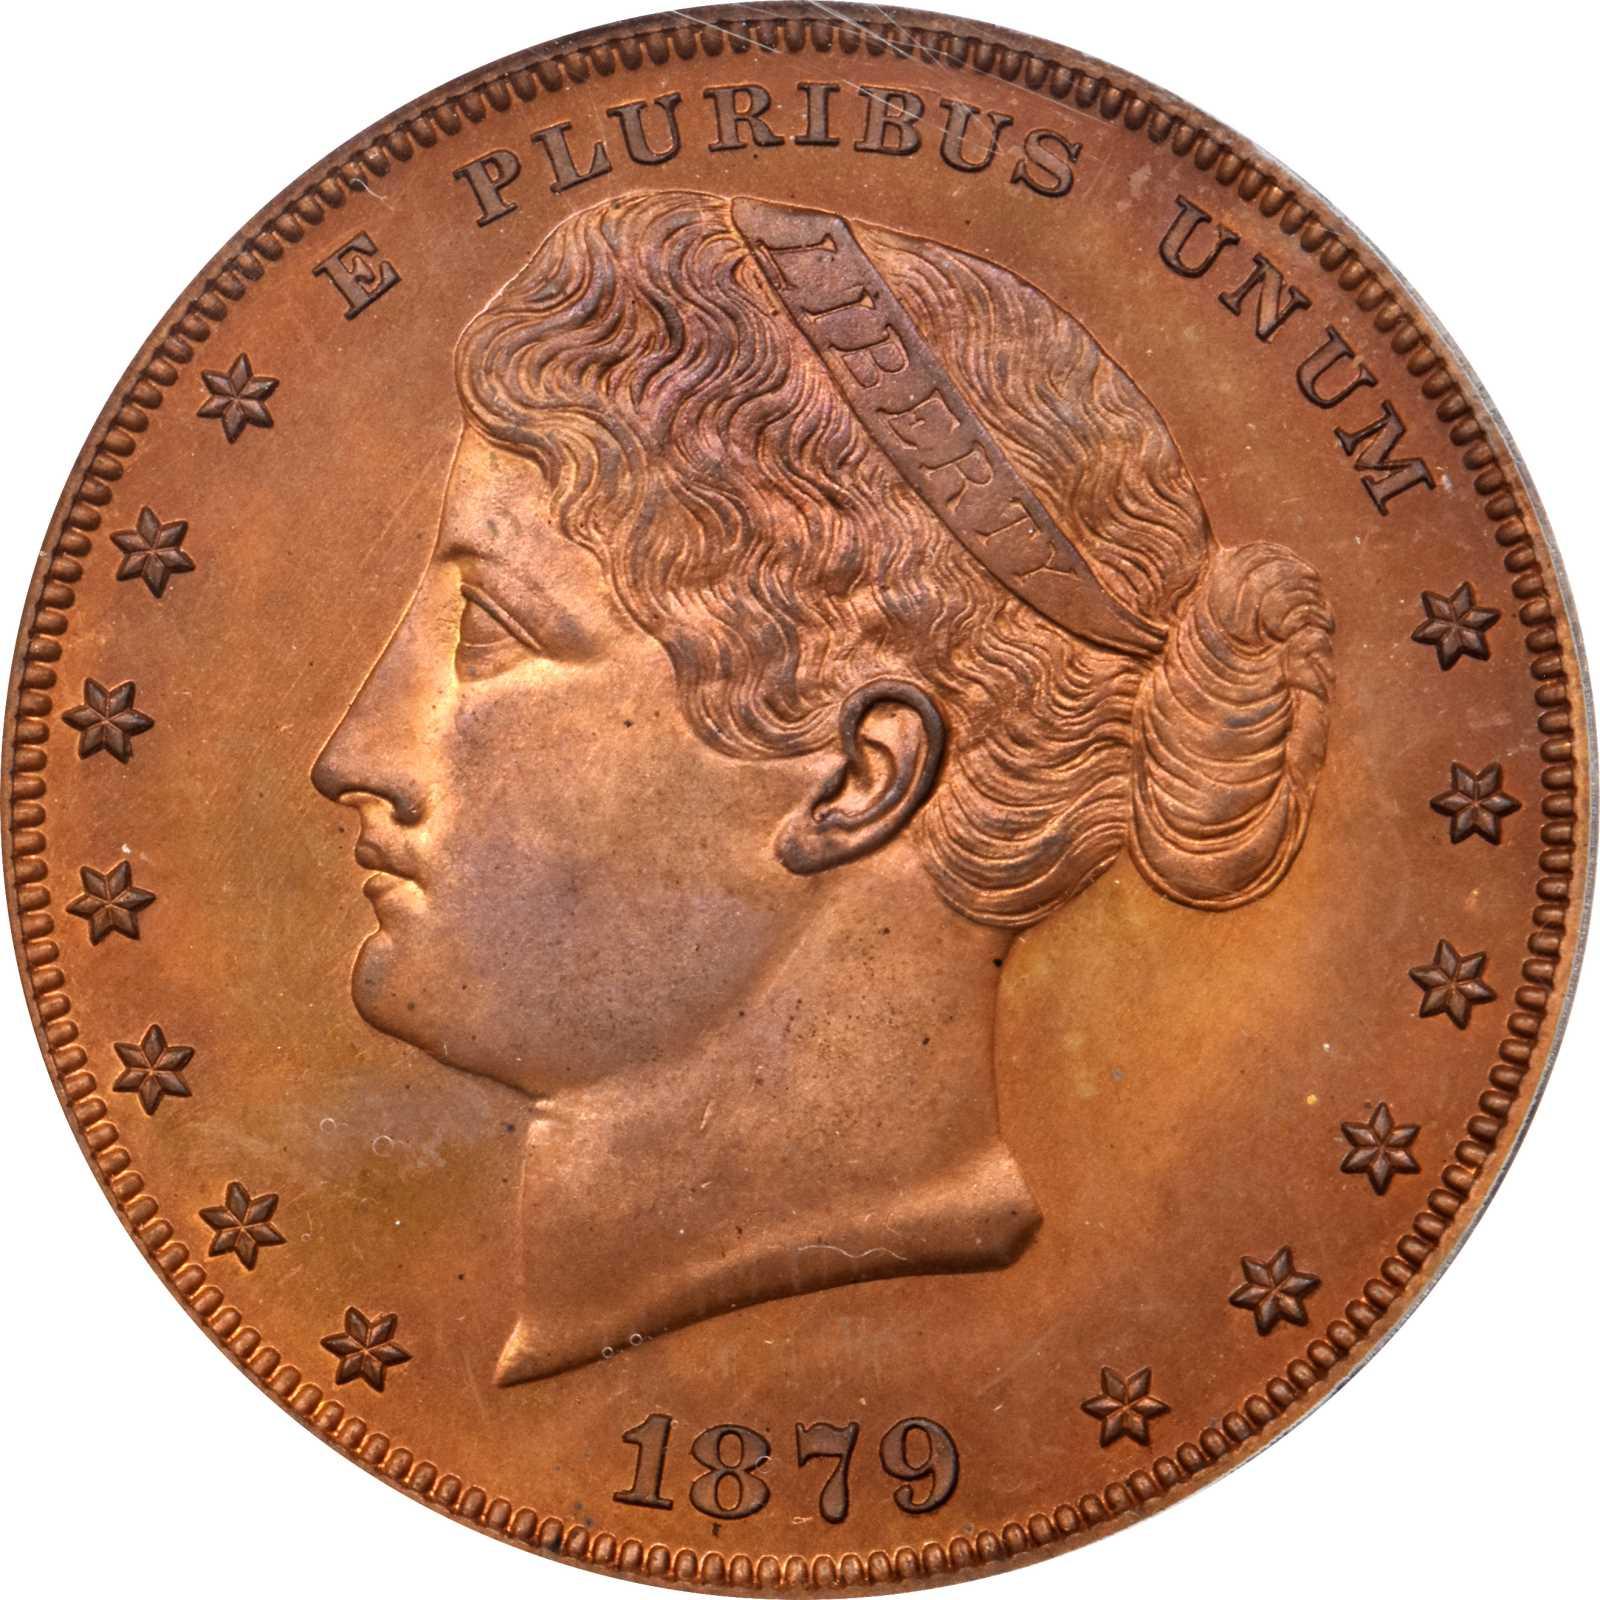 sample image for 1879 J-1623 P$1 PR RD